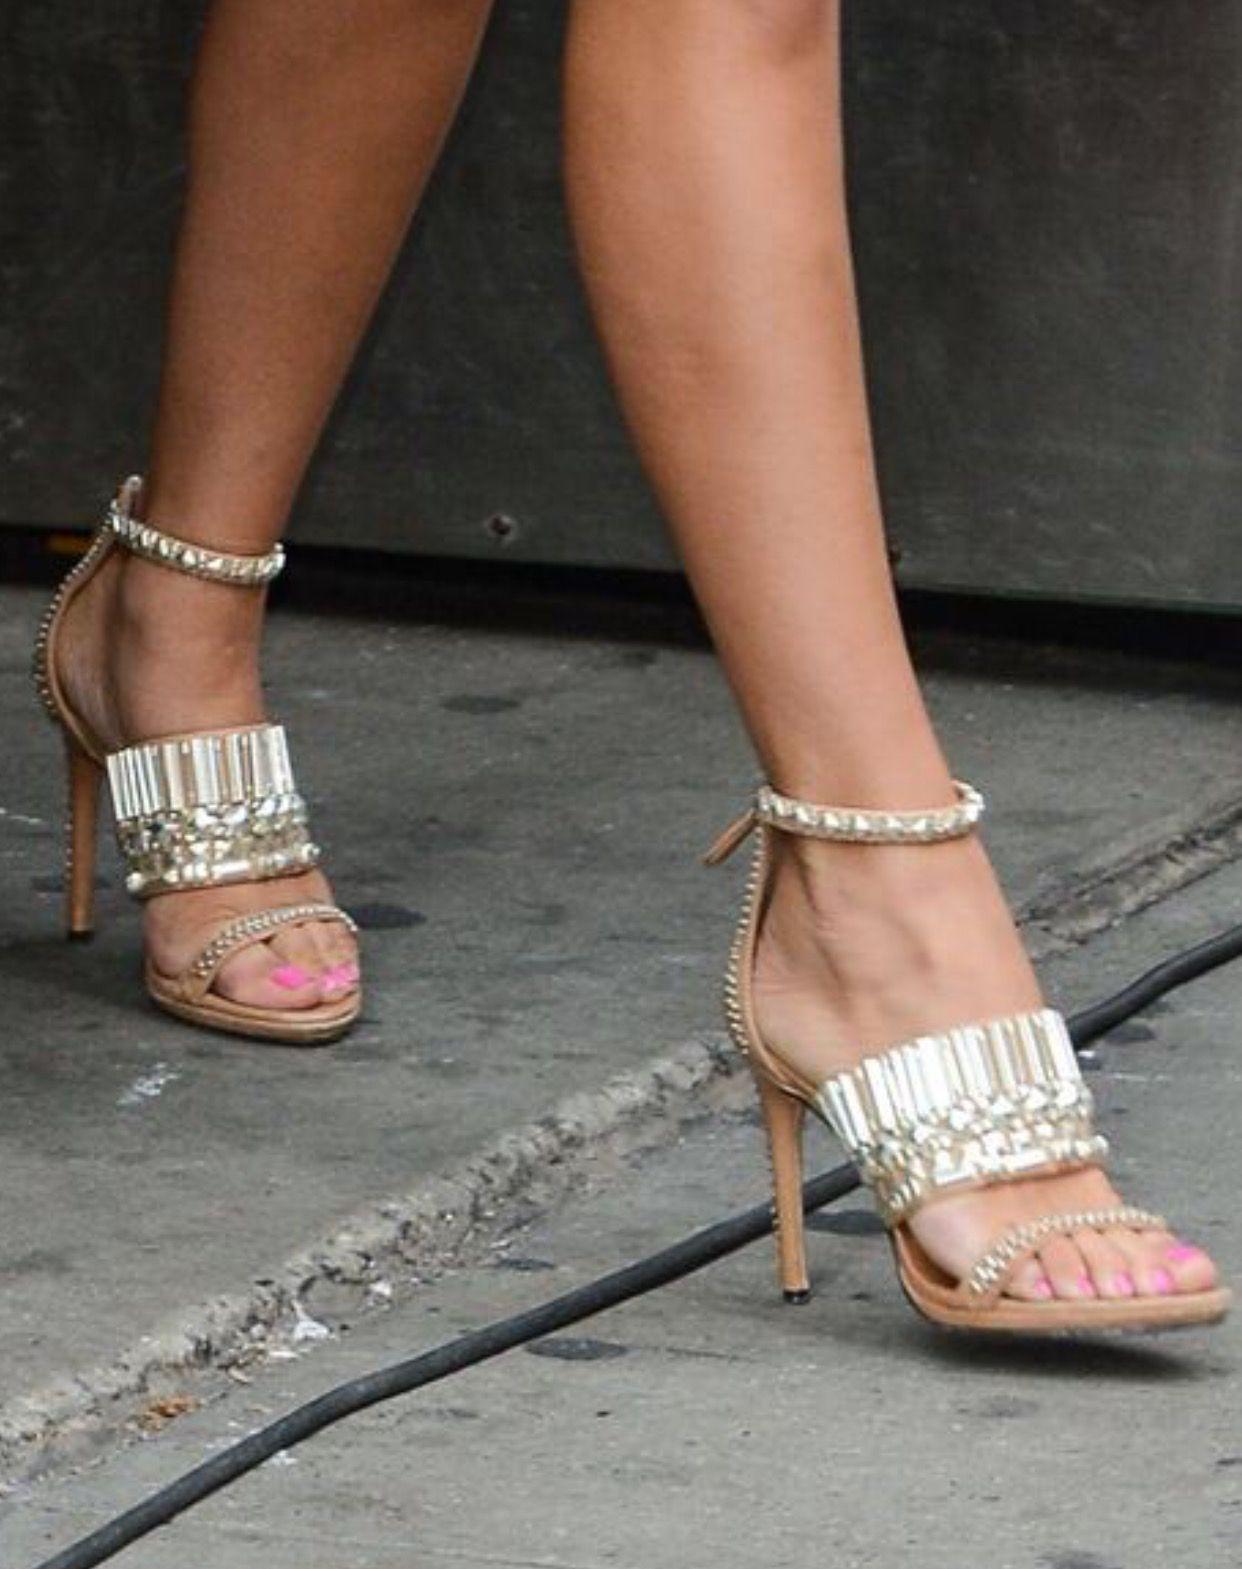 Andi Dorfman Feet photo 6